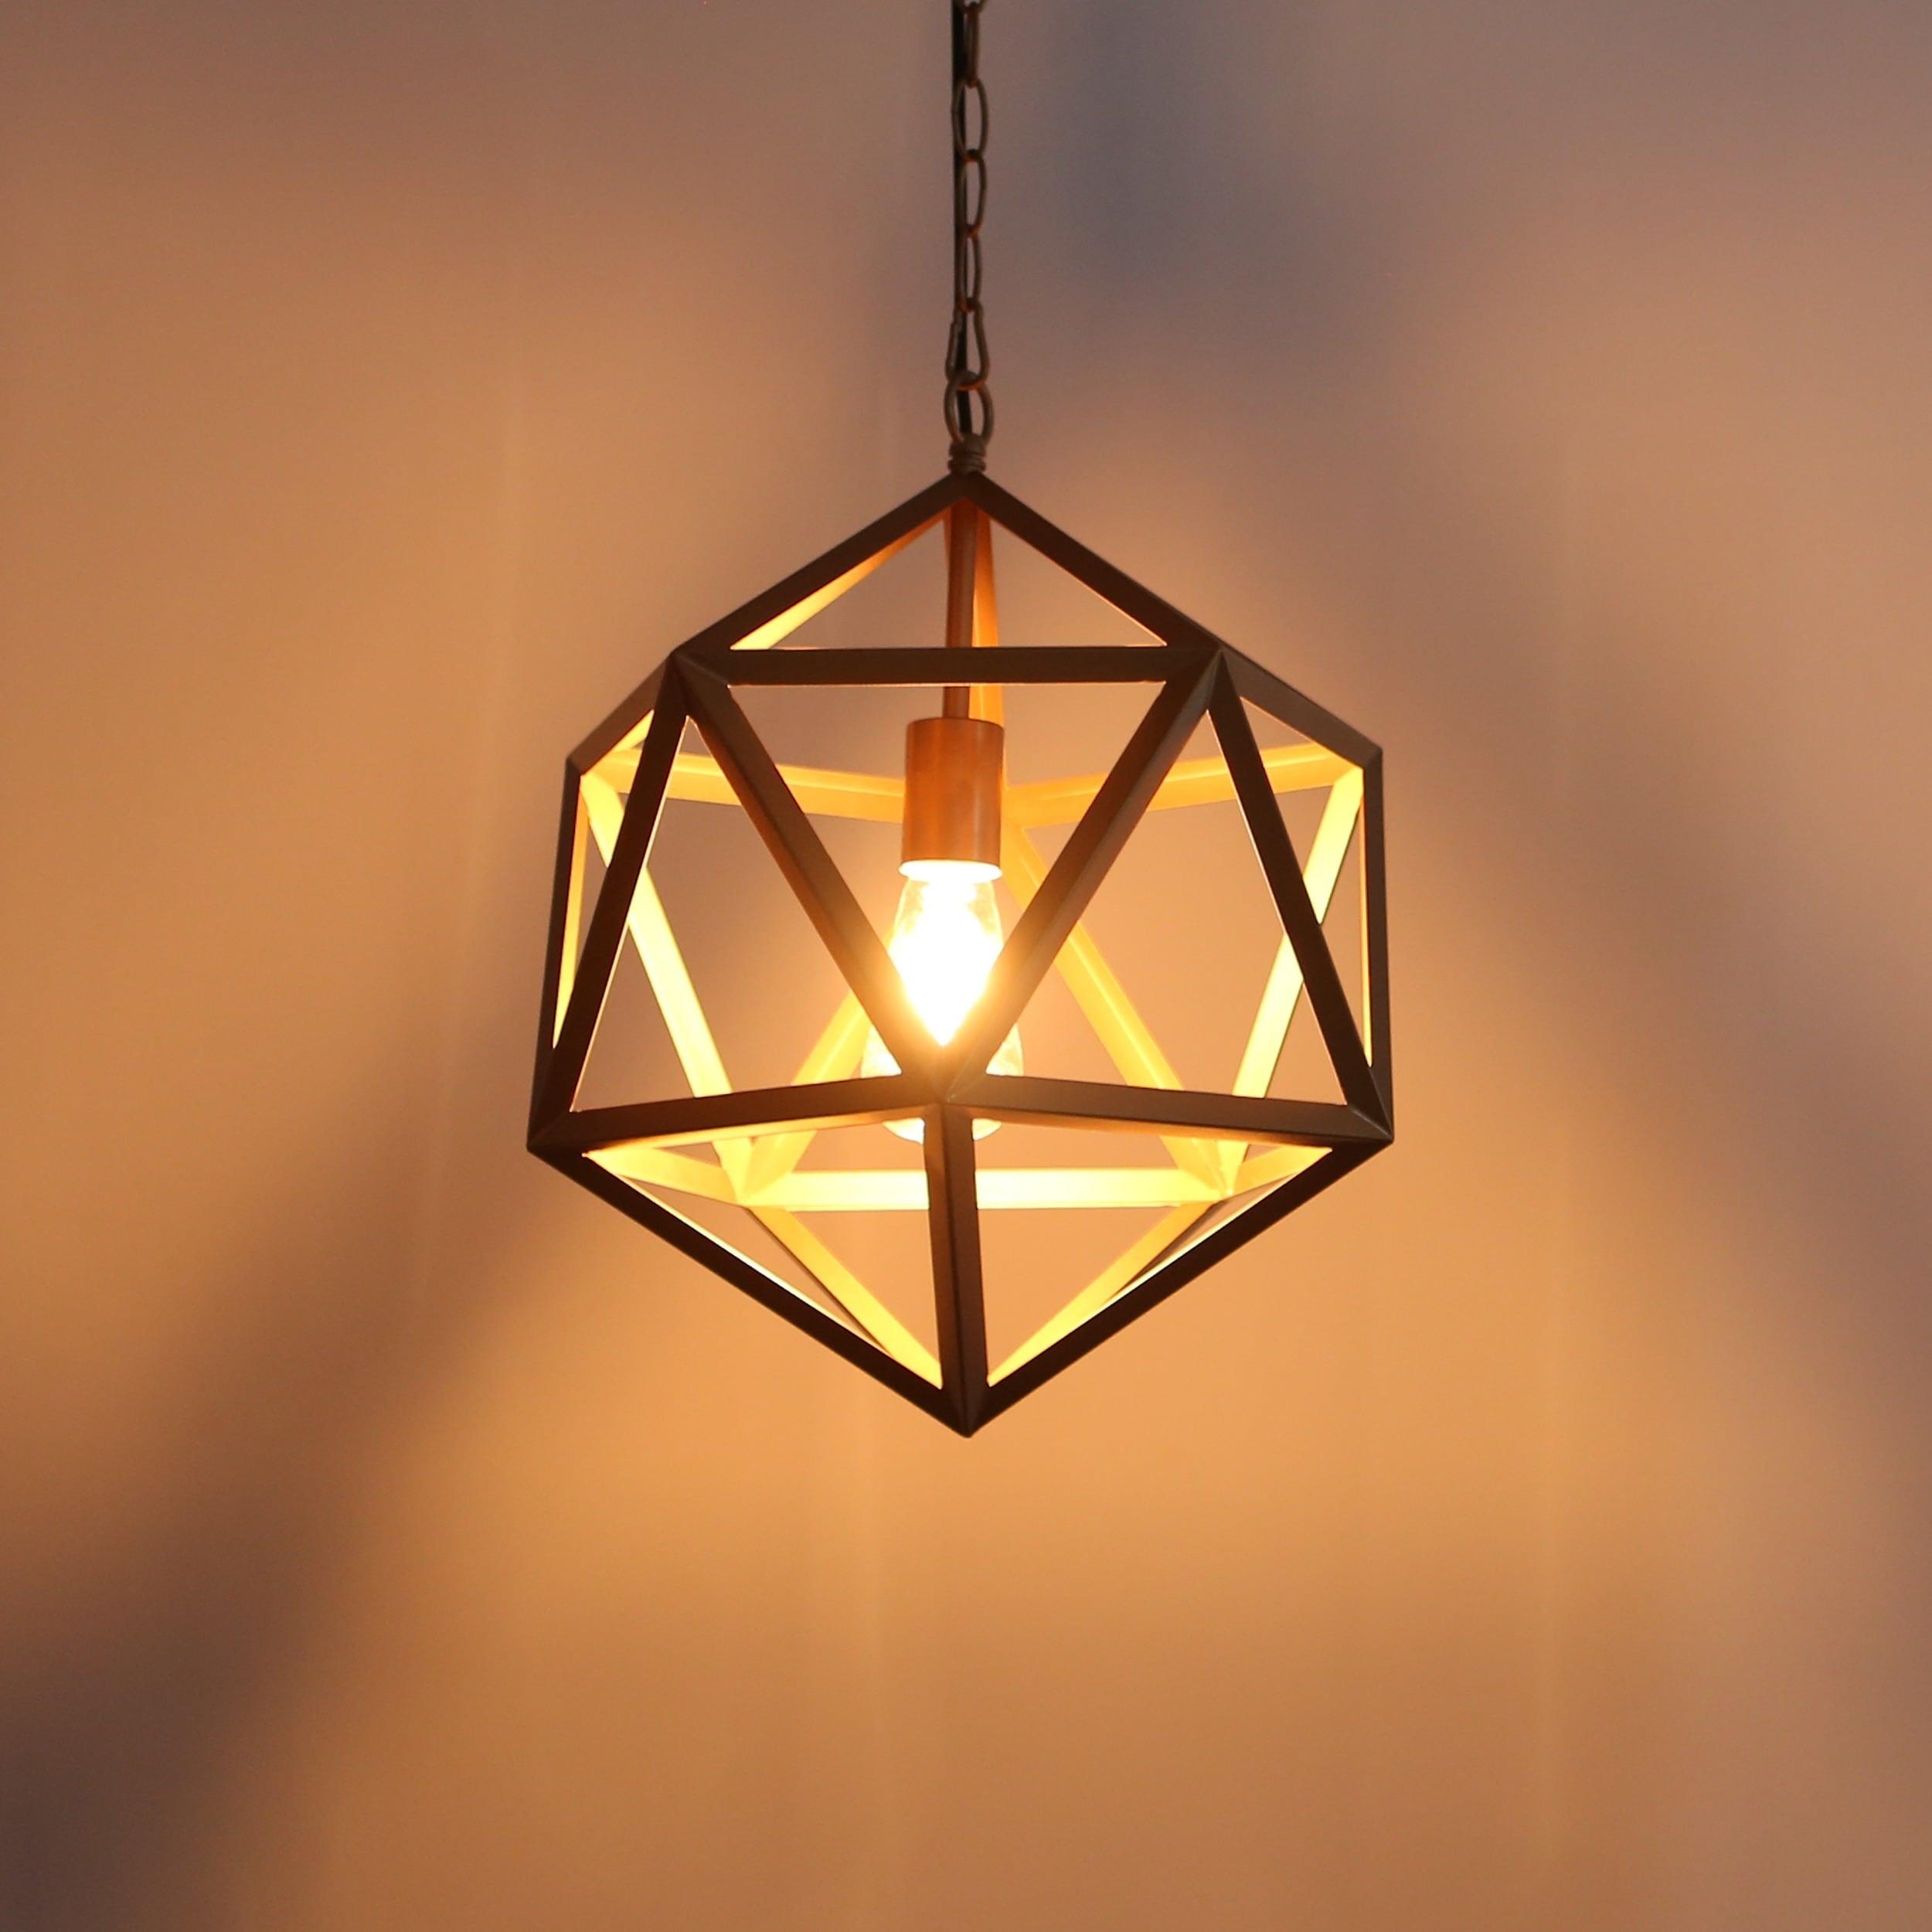 journee lighting. Journee Collection \u0027Lancaster\u0027 Iron 16-inch Hardwired Edison Bulb Pendant Lamp - Free Shipping Today Overstock 23426339 Lighting E